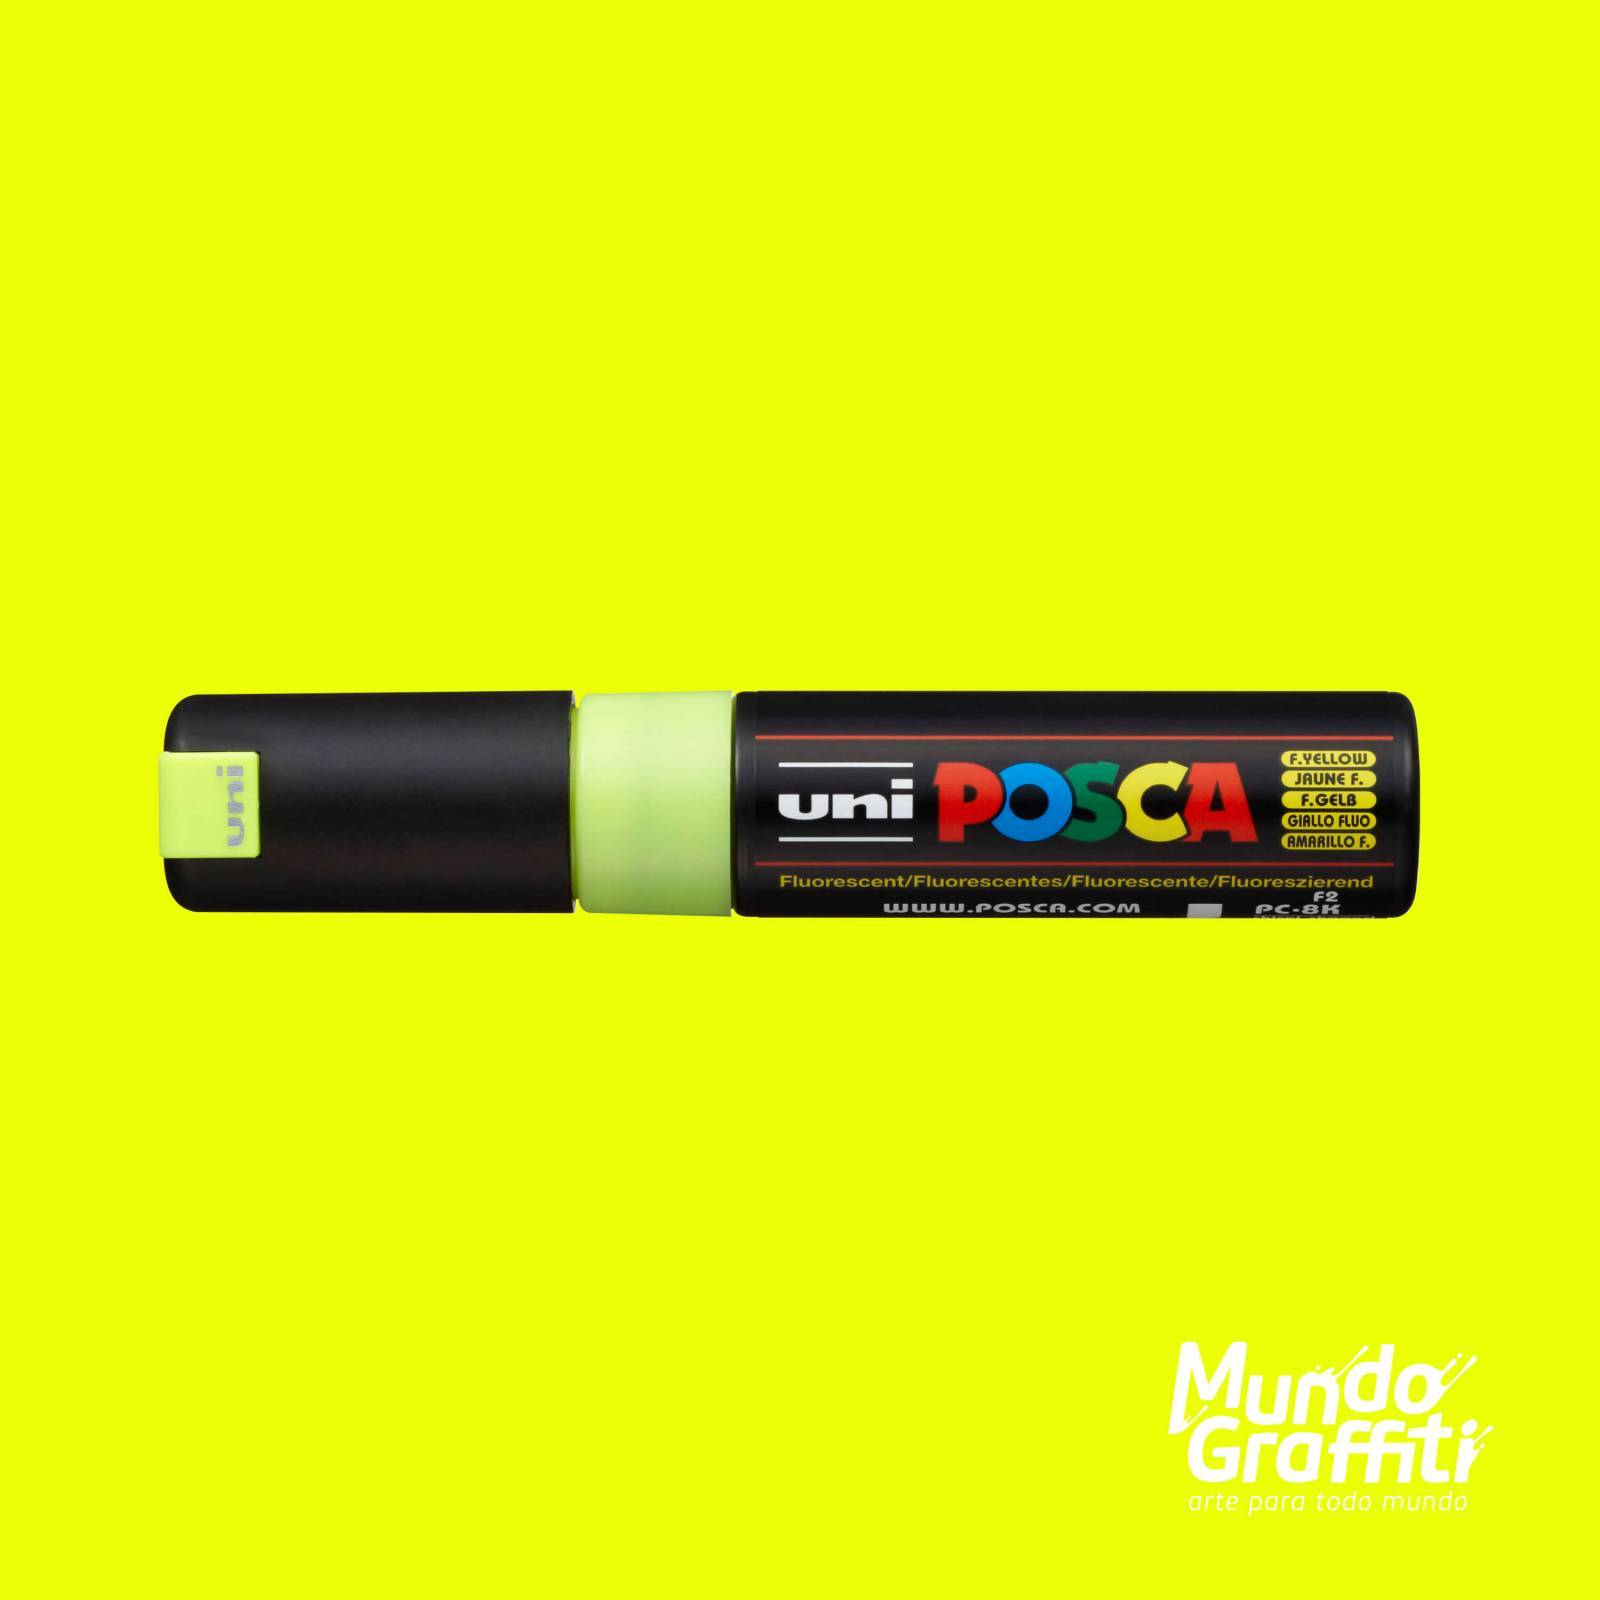 Caneta Posca 8K Amarelo Fluorescente - Mundo Graffiti